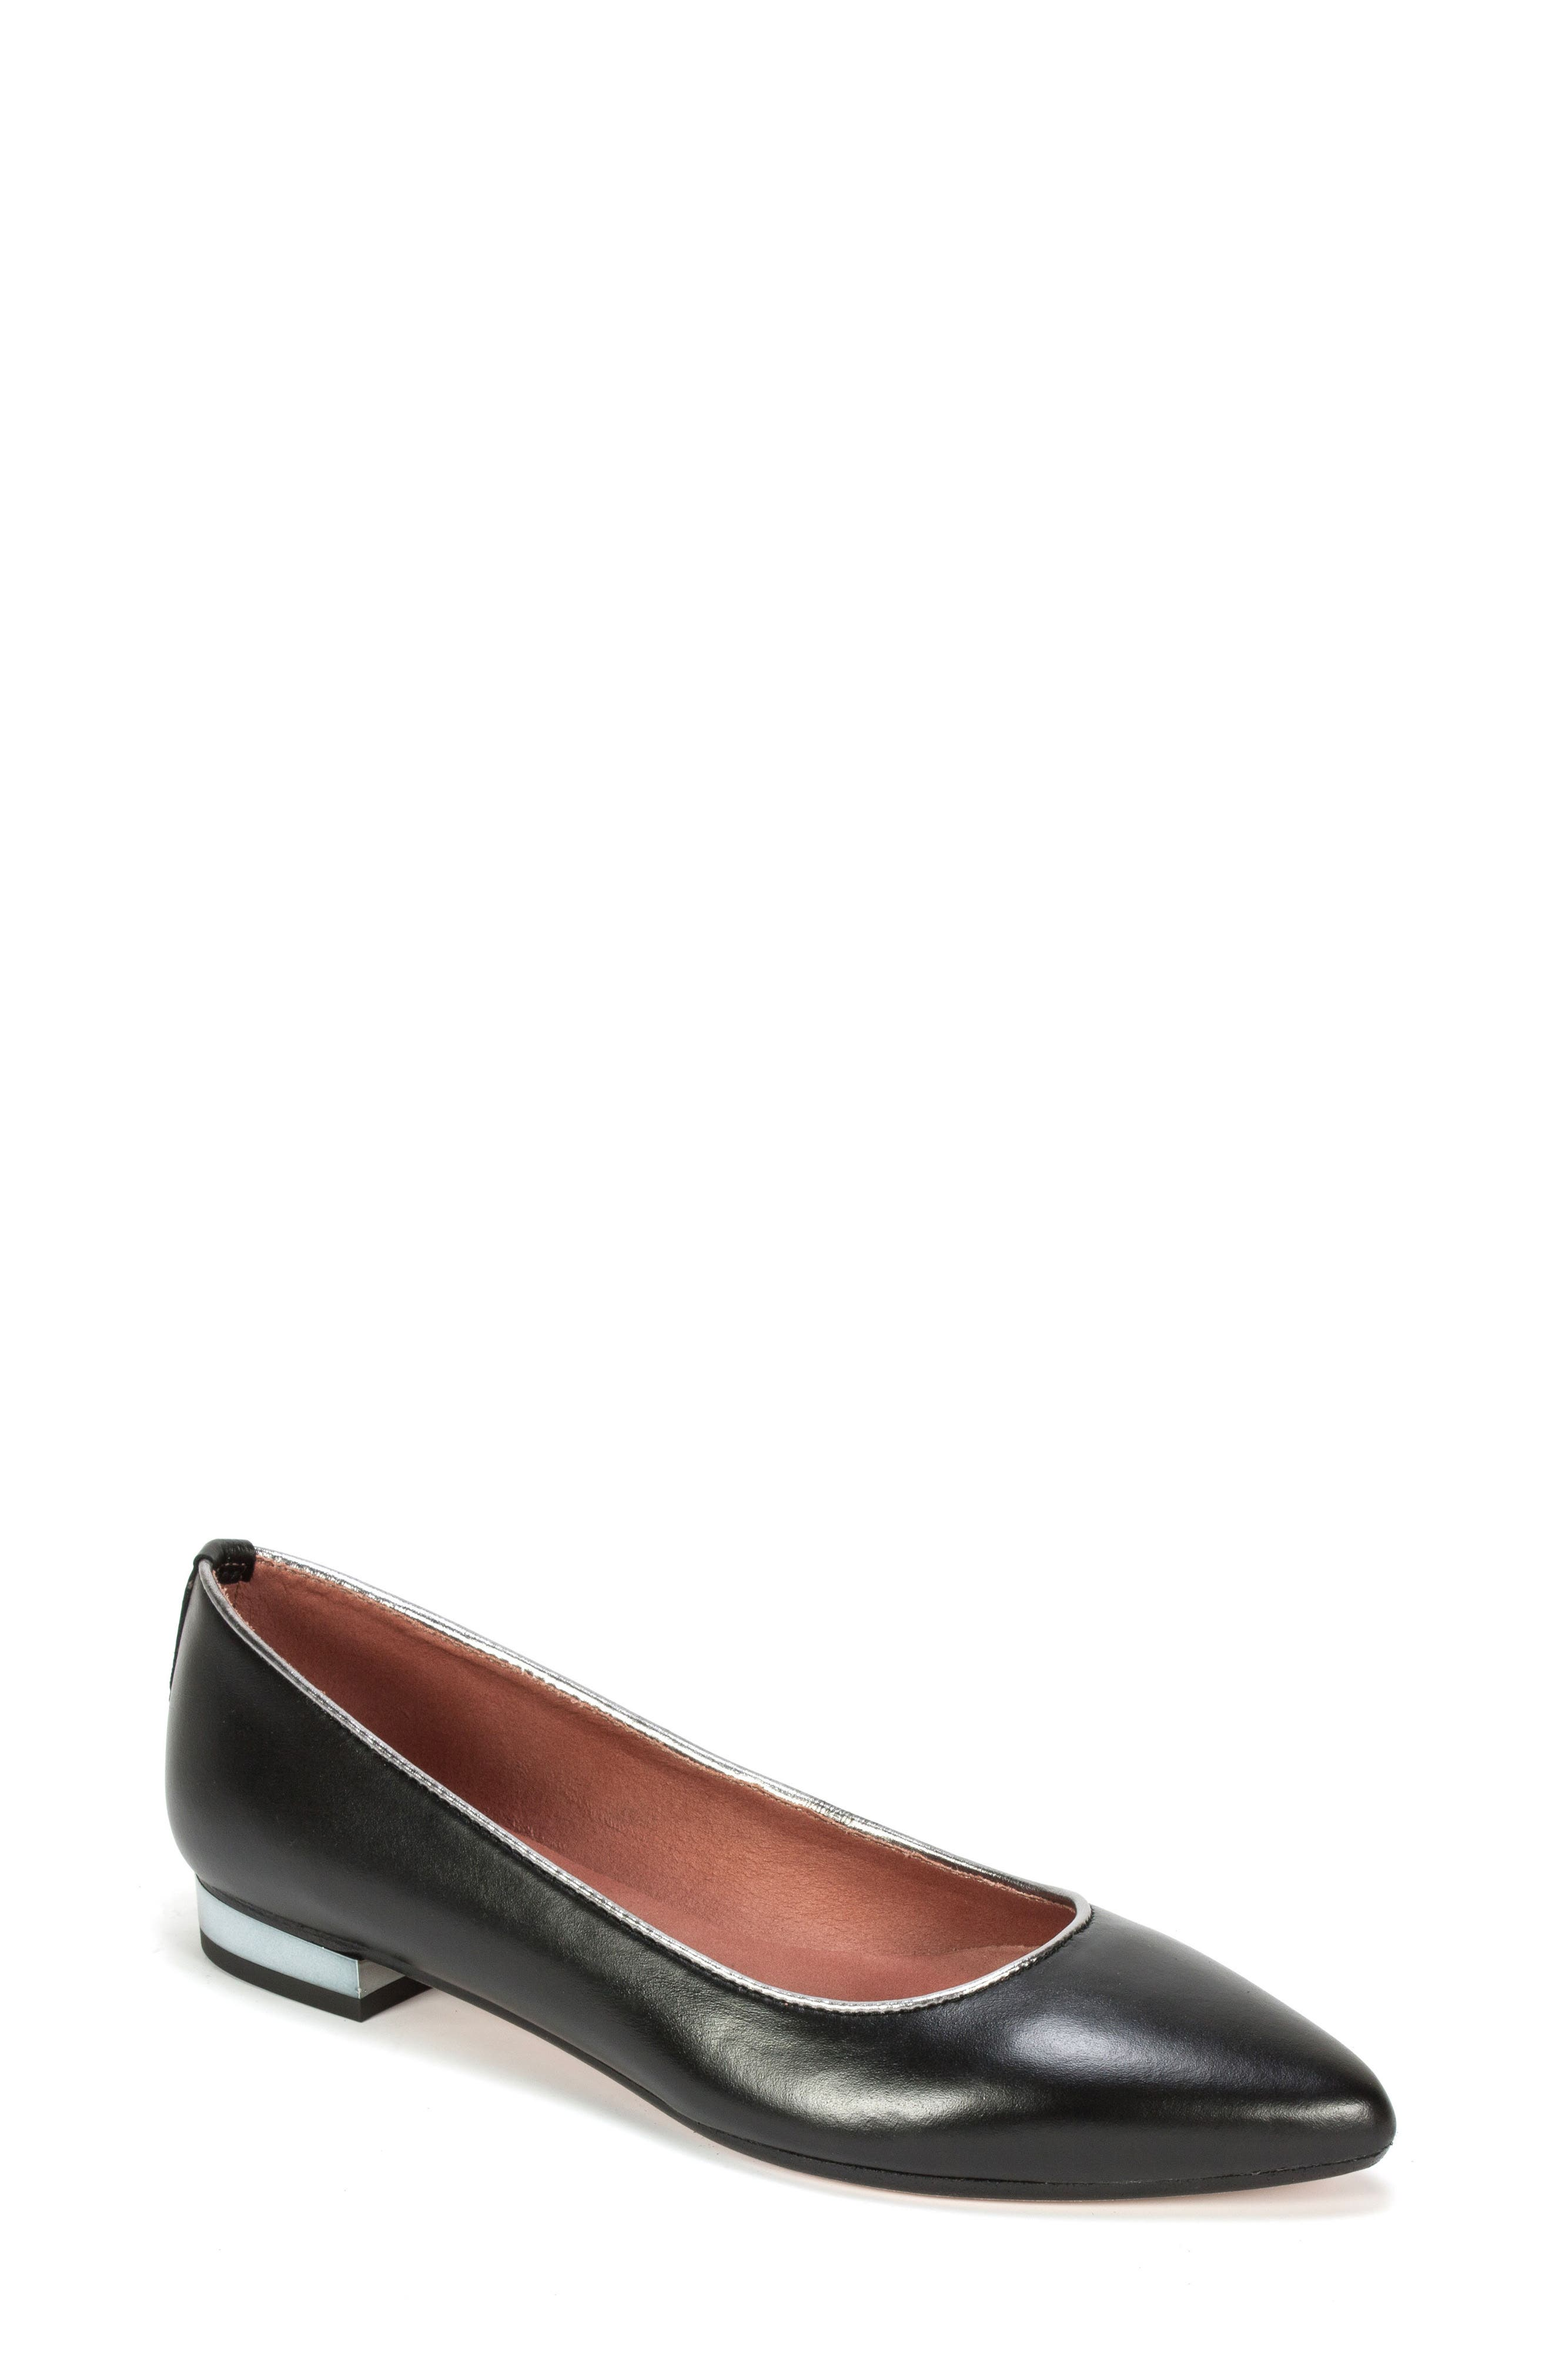 Karolina Flat,                         Main,                         color, Black Leather